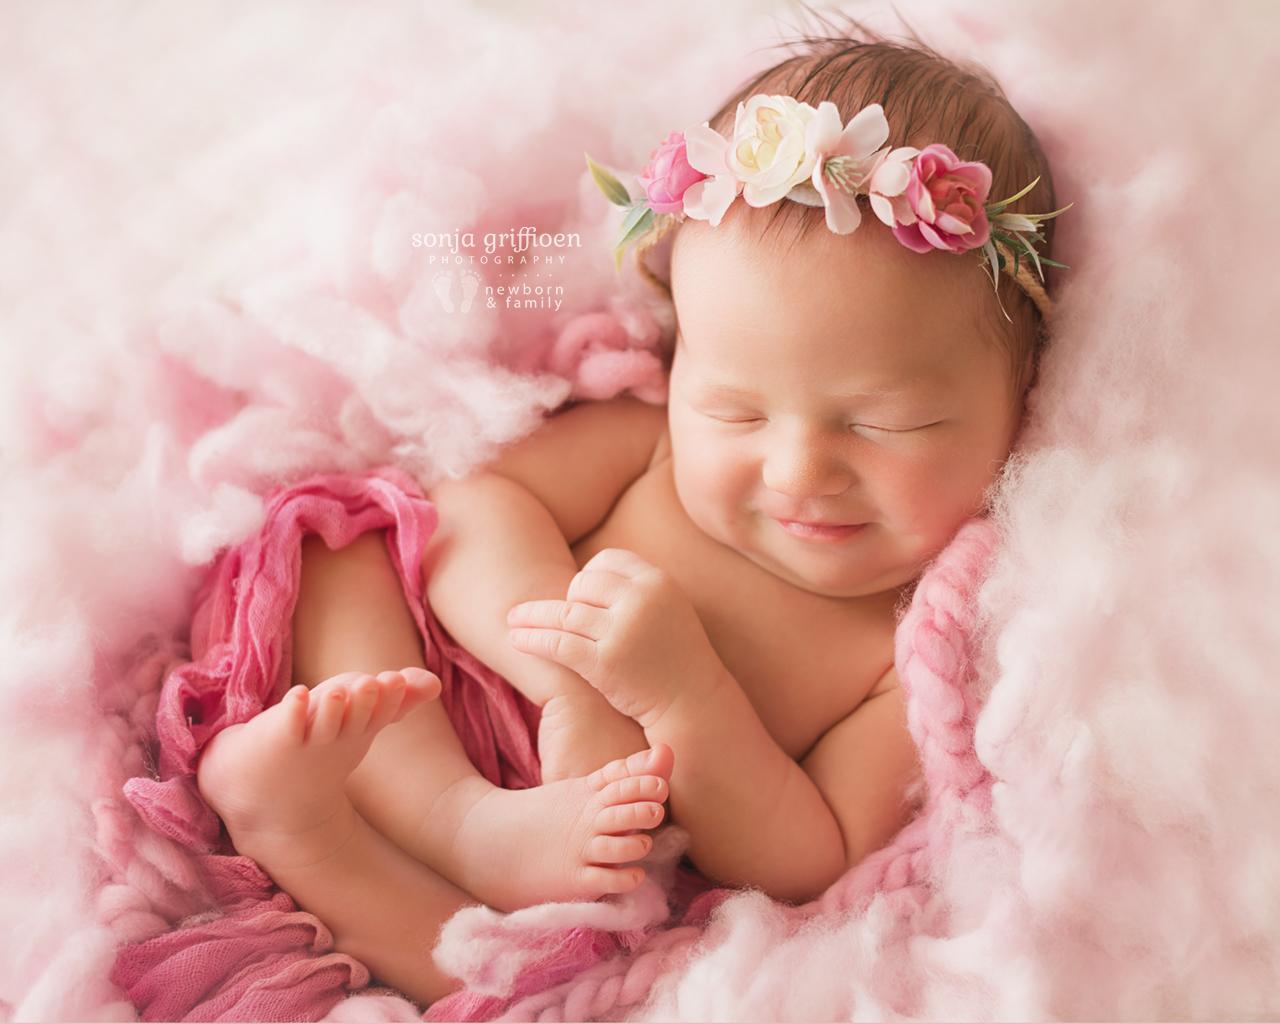 Estella-Newborn-Brisbane-Newborn-Photographer-Sonja-Griffioen-24.jpg